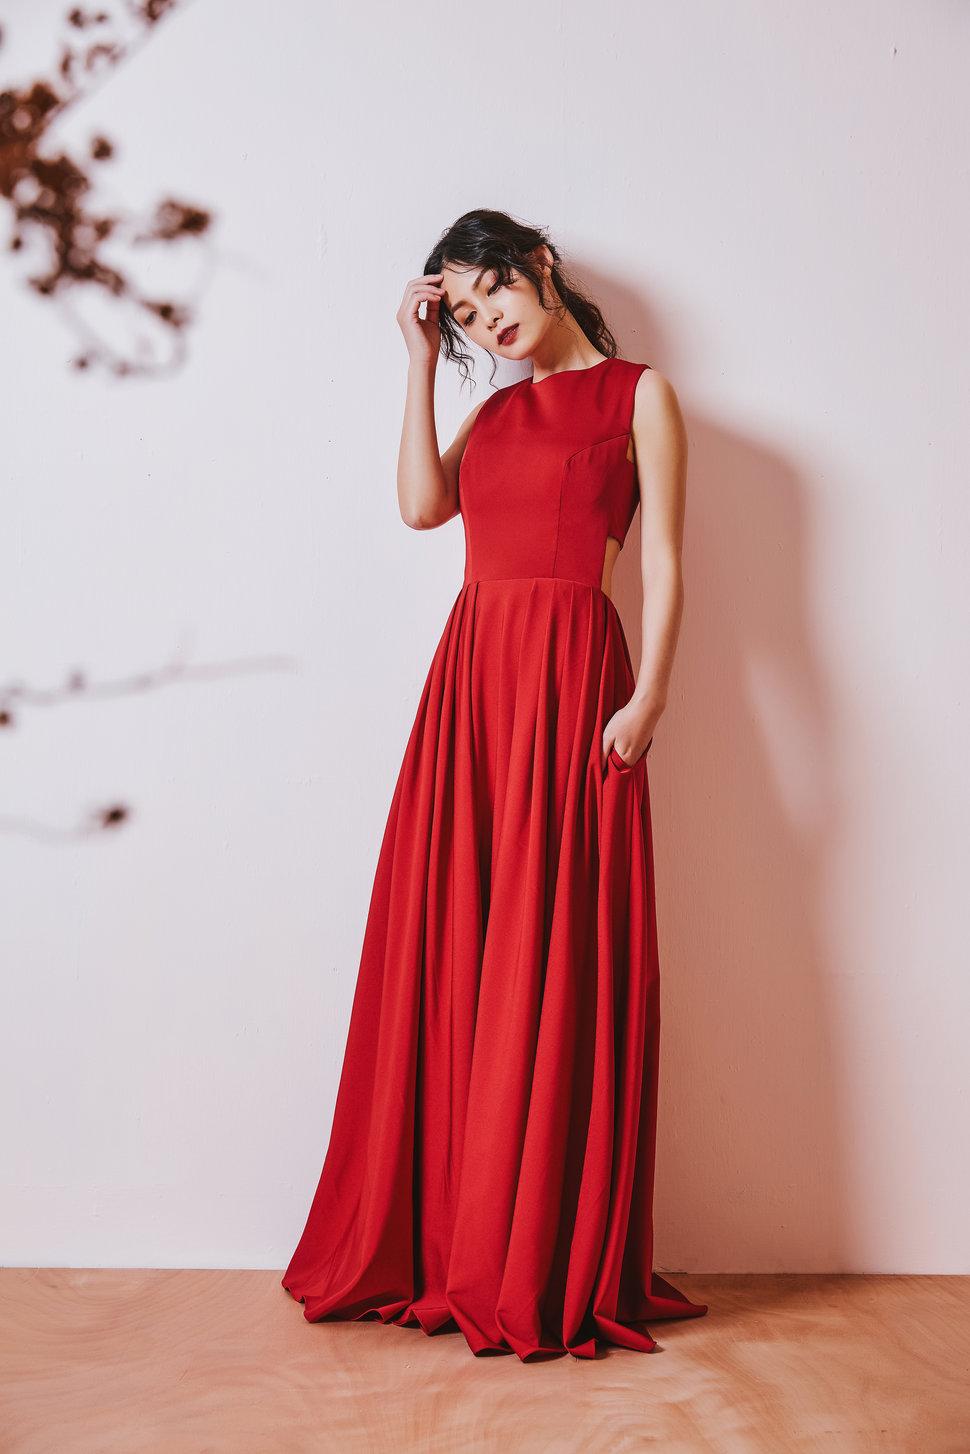 2019032718516 - Mikeshi wedding 米娔詩手《結婚吧》